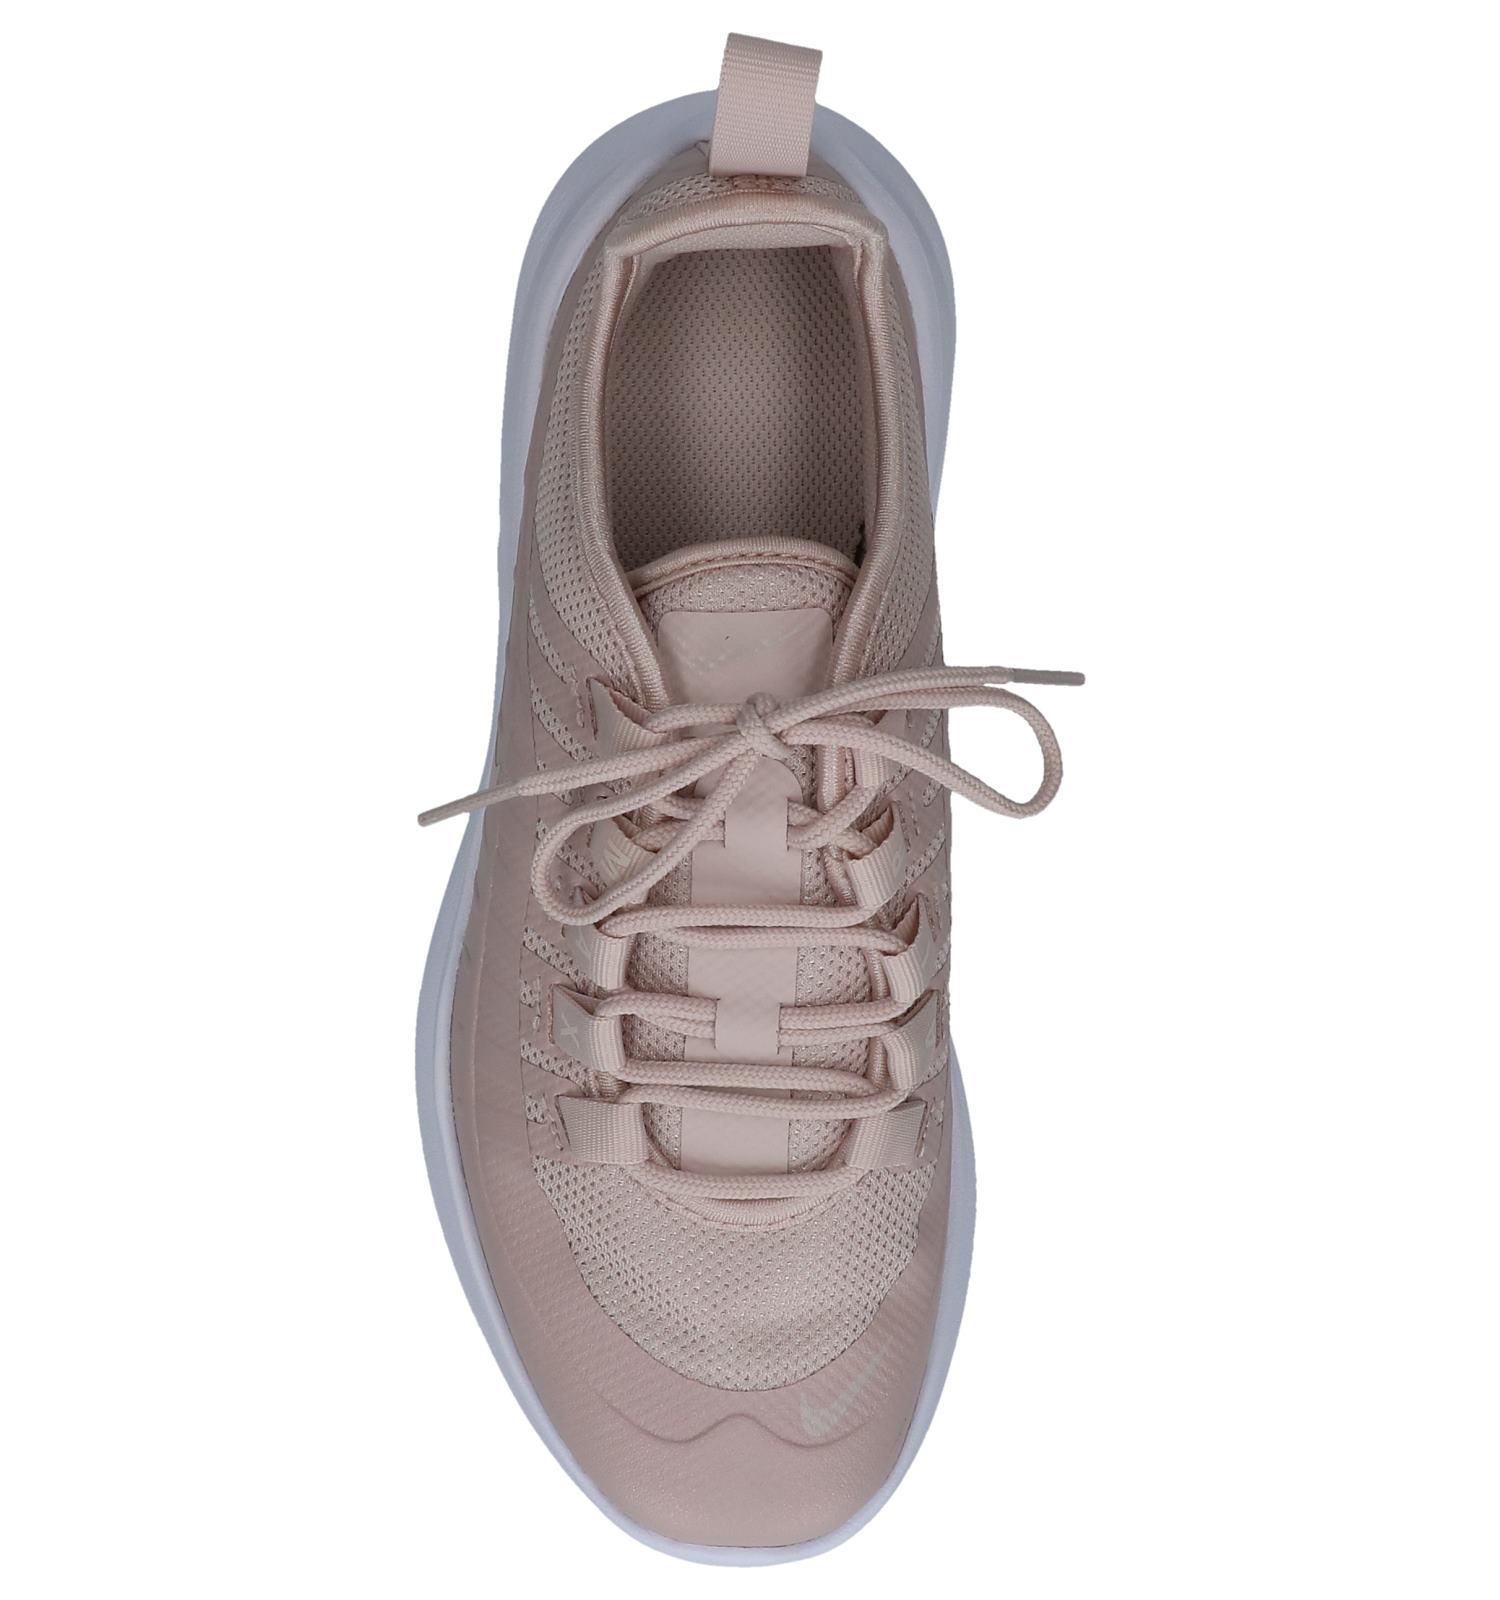 723dbfee649 Lichtroze Nike Air Max Sneakers | TORFS.BE | Gratis verzend en retour